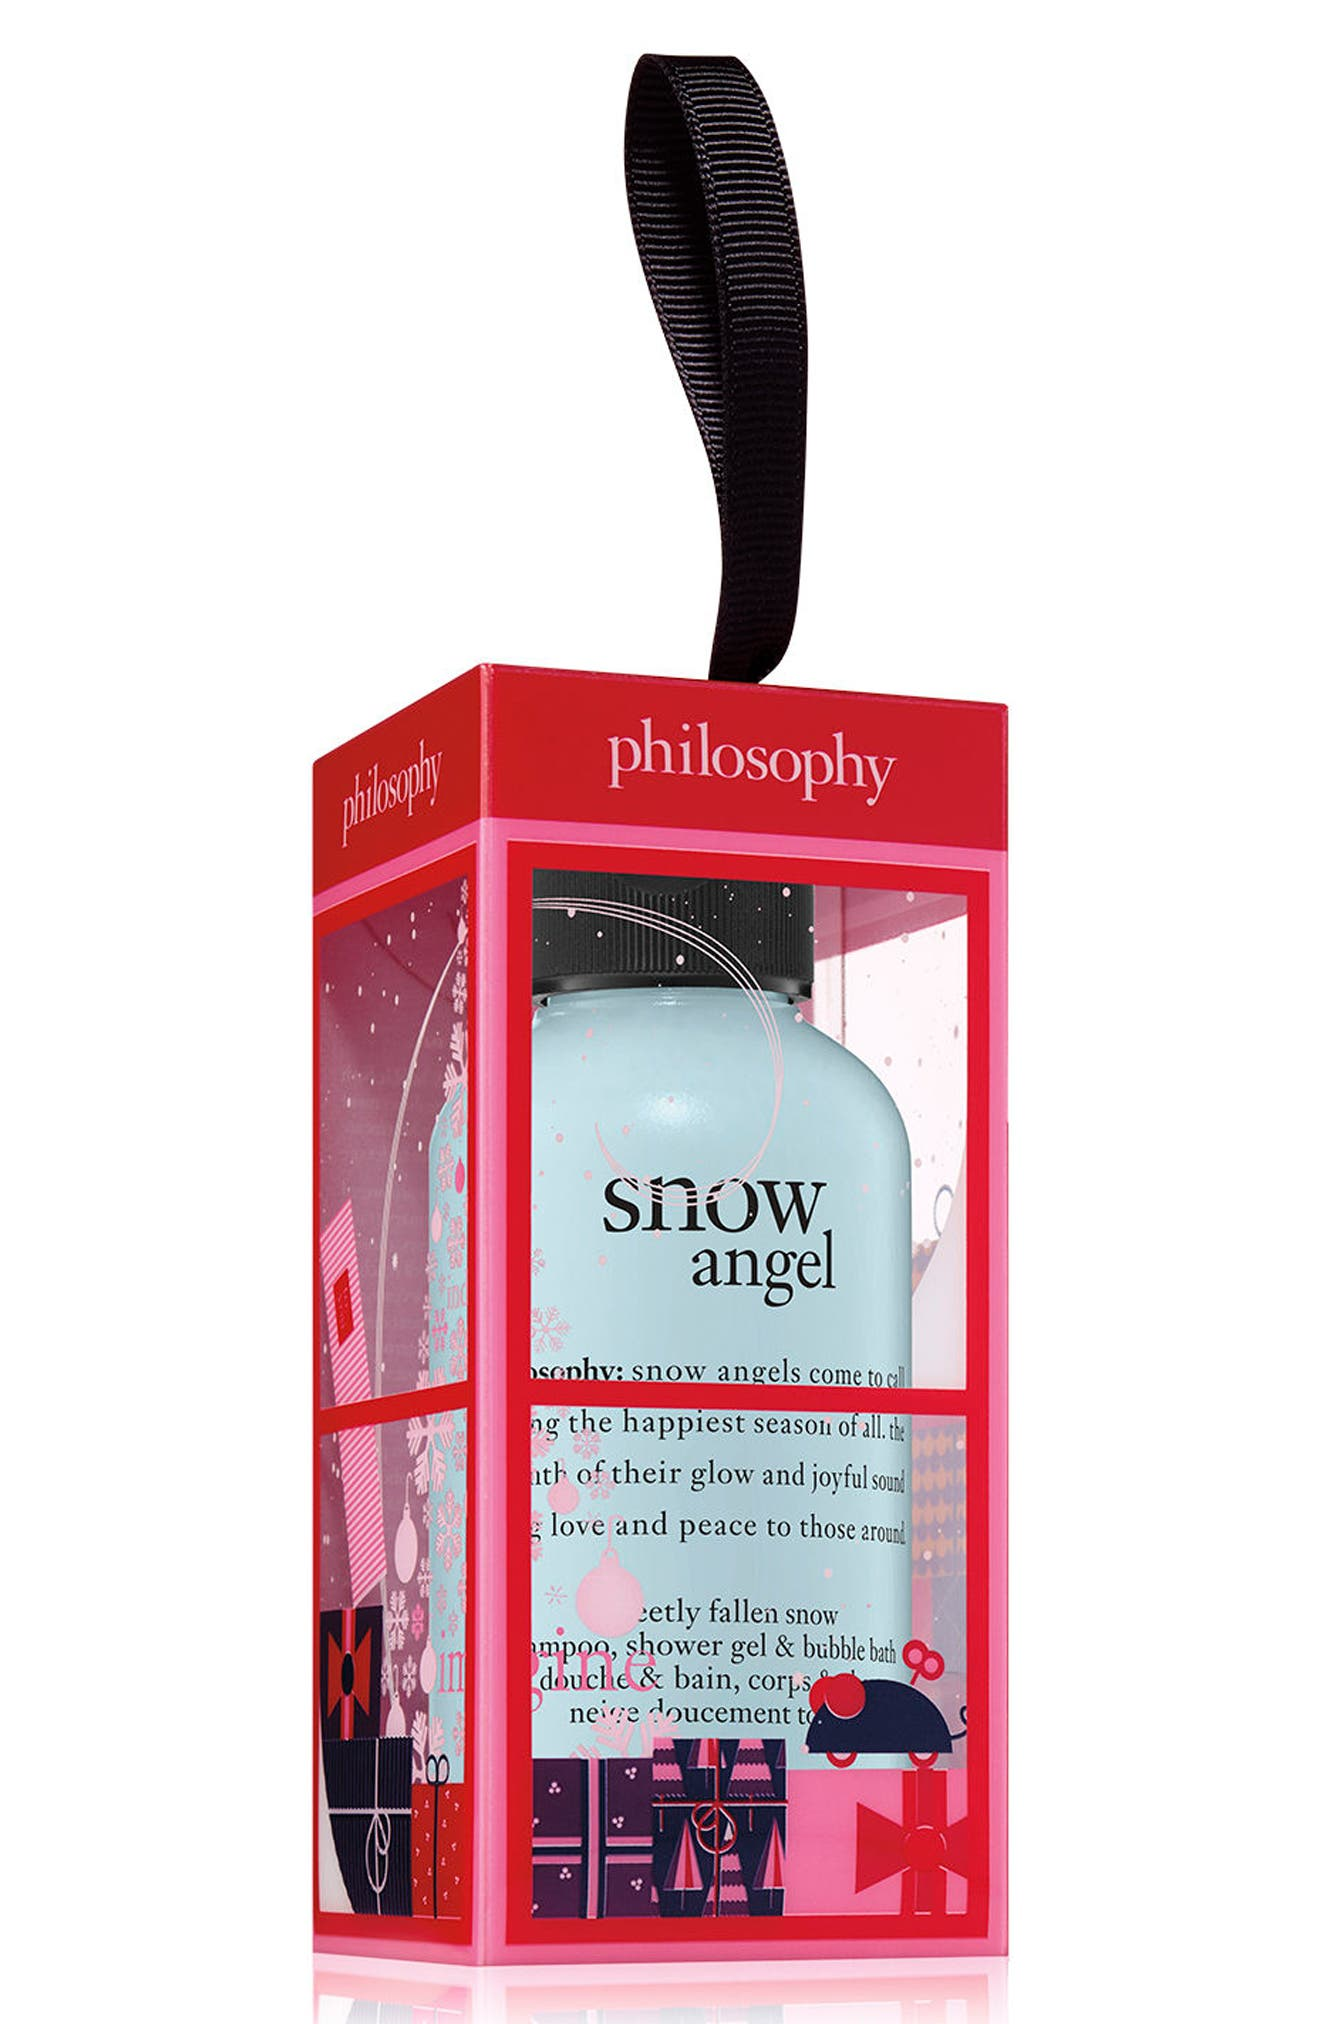 philosophy snow angel shampoo, shower gel & bubble bath ornament (Limited Edition)